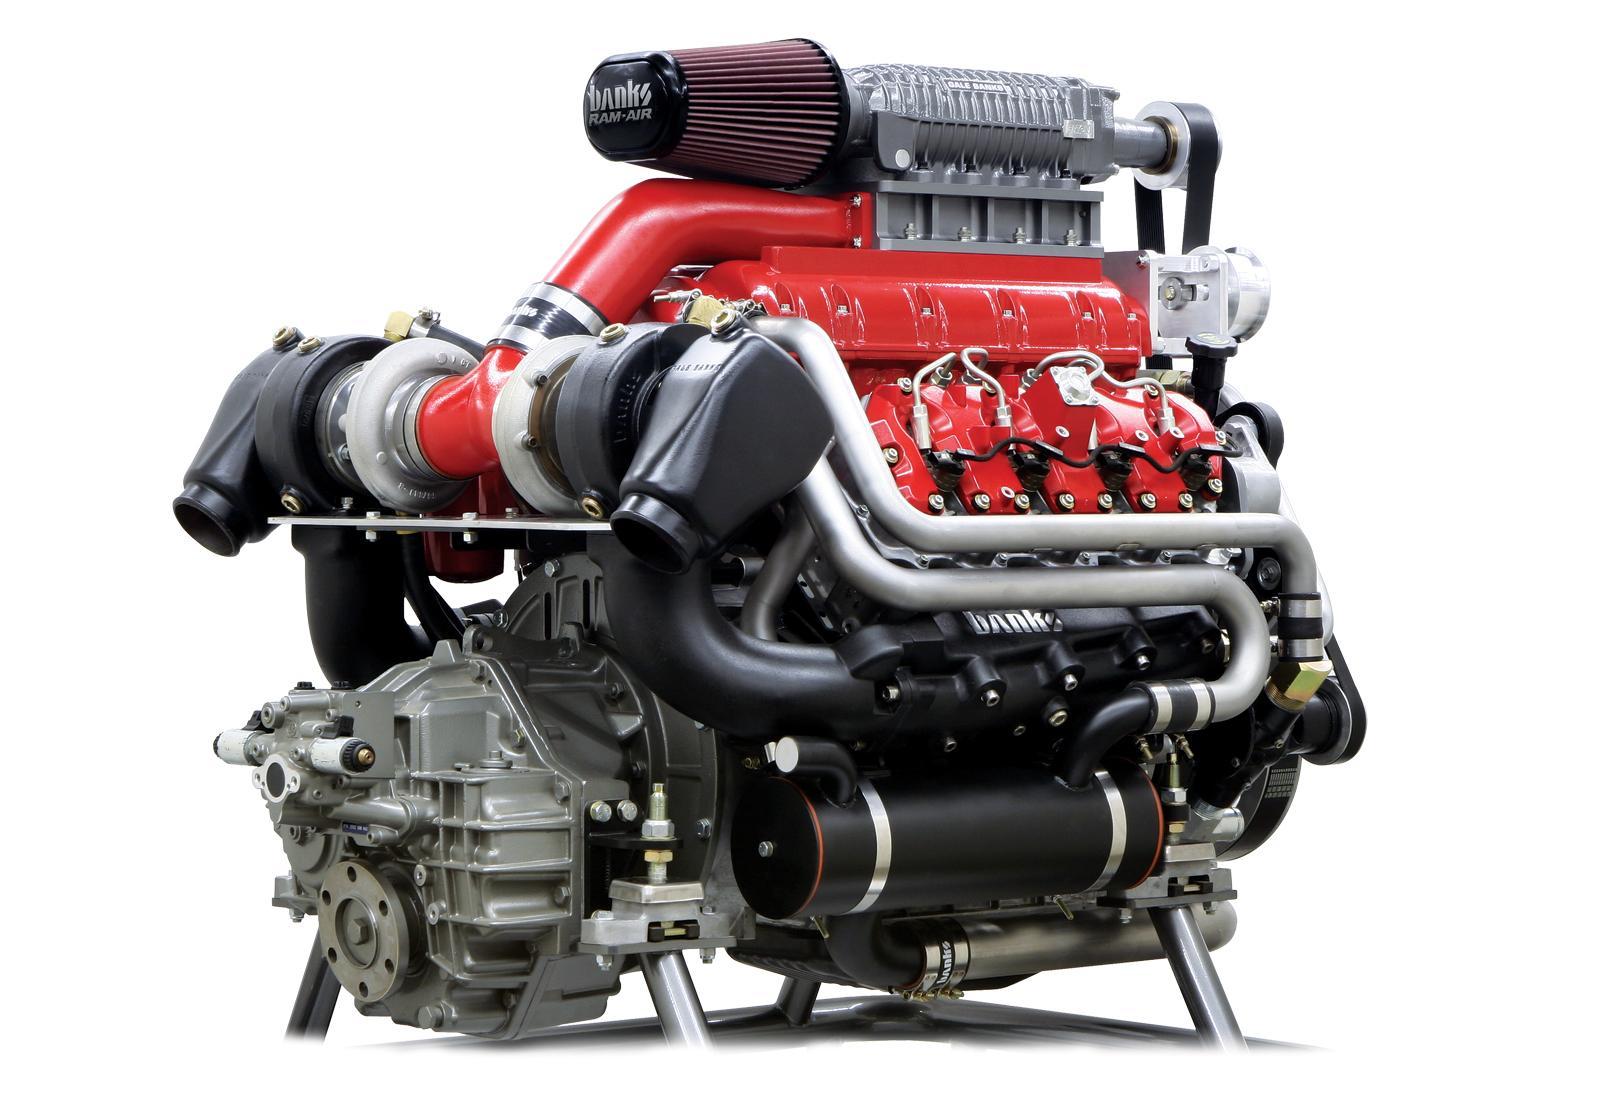 V8 Diesel Conversion On Perentie